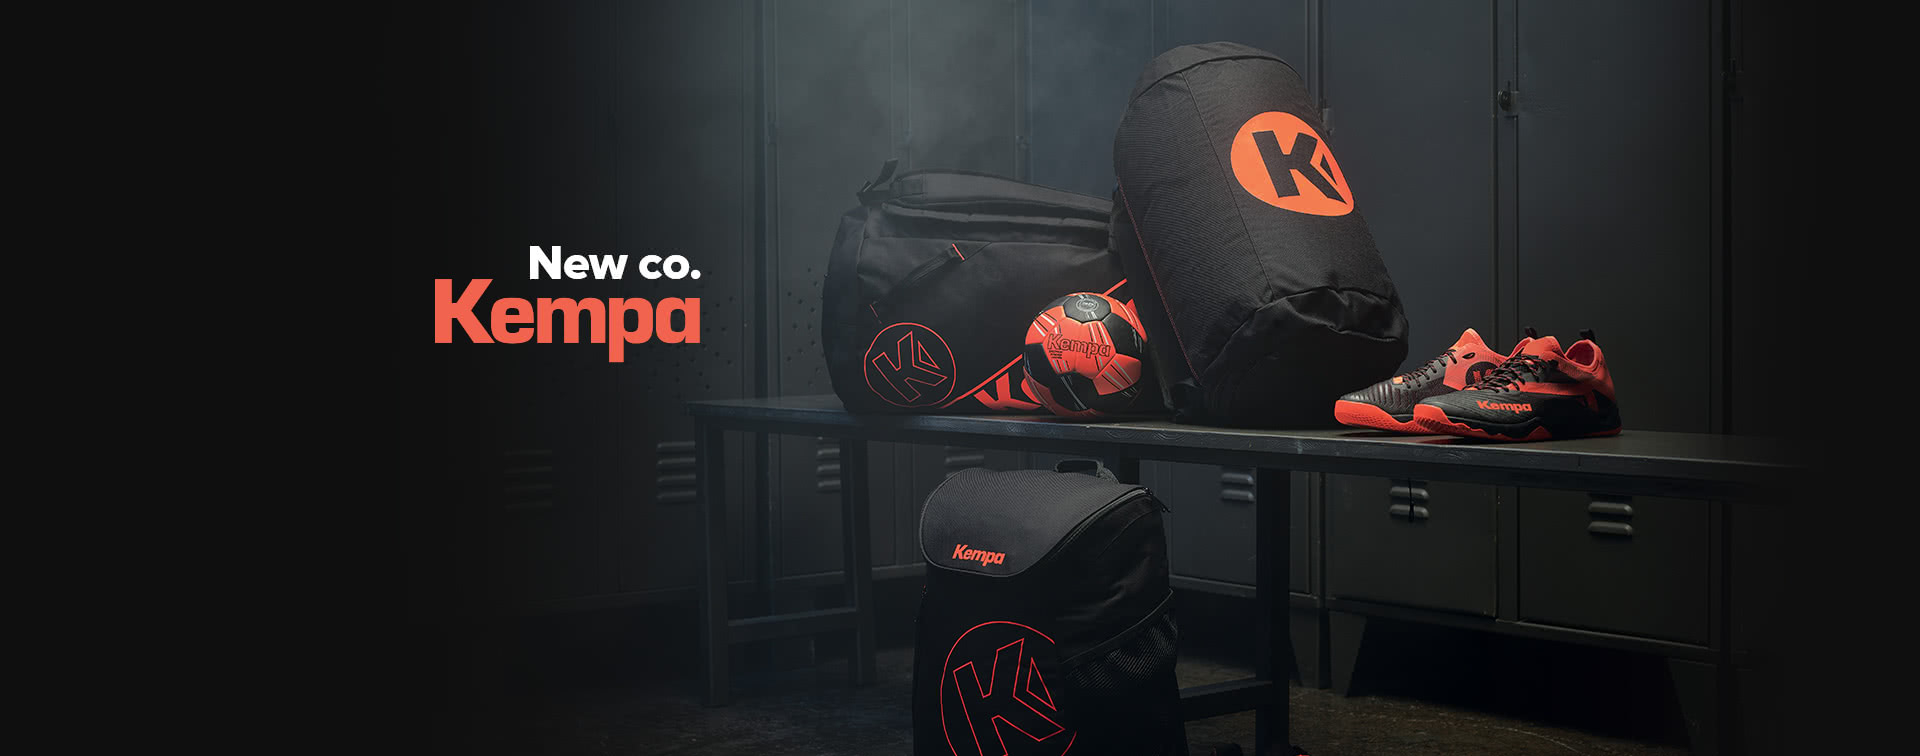 New Co Kempa